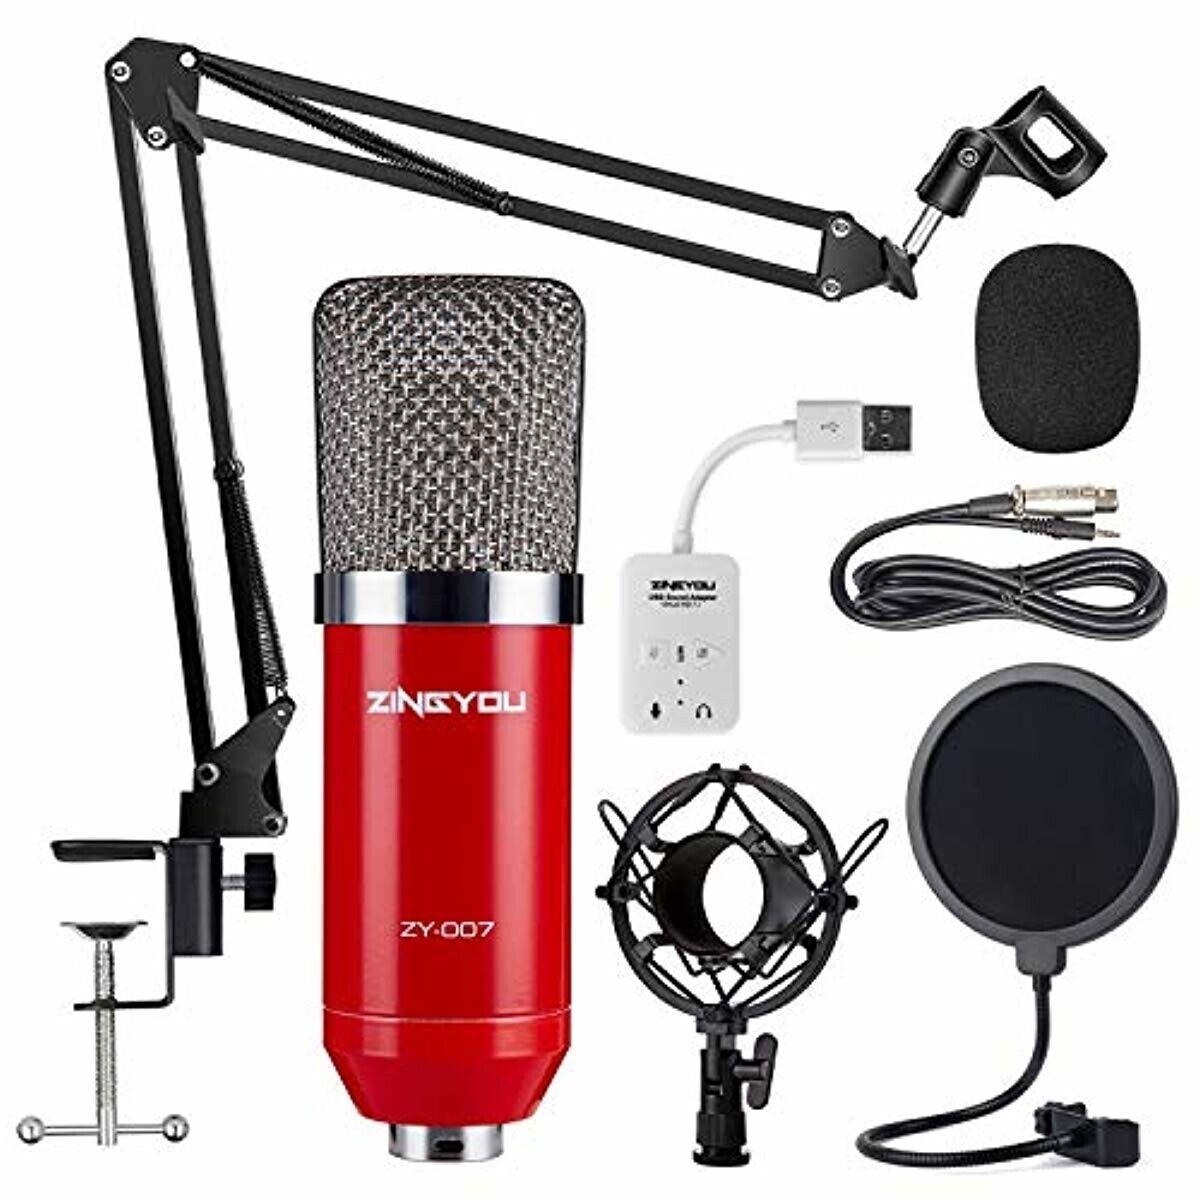 Microfono De Estudio Profesional Para Grabaciones O Programas En Vivo Red